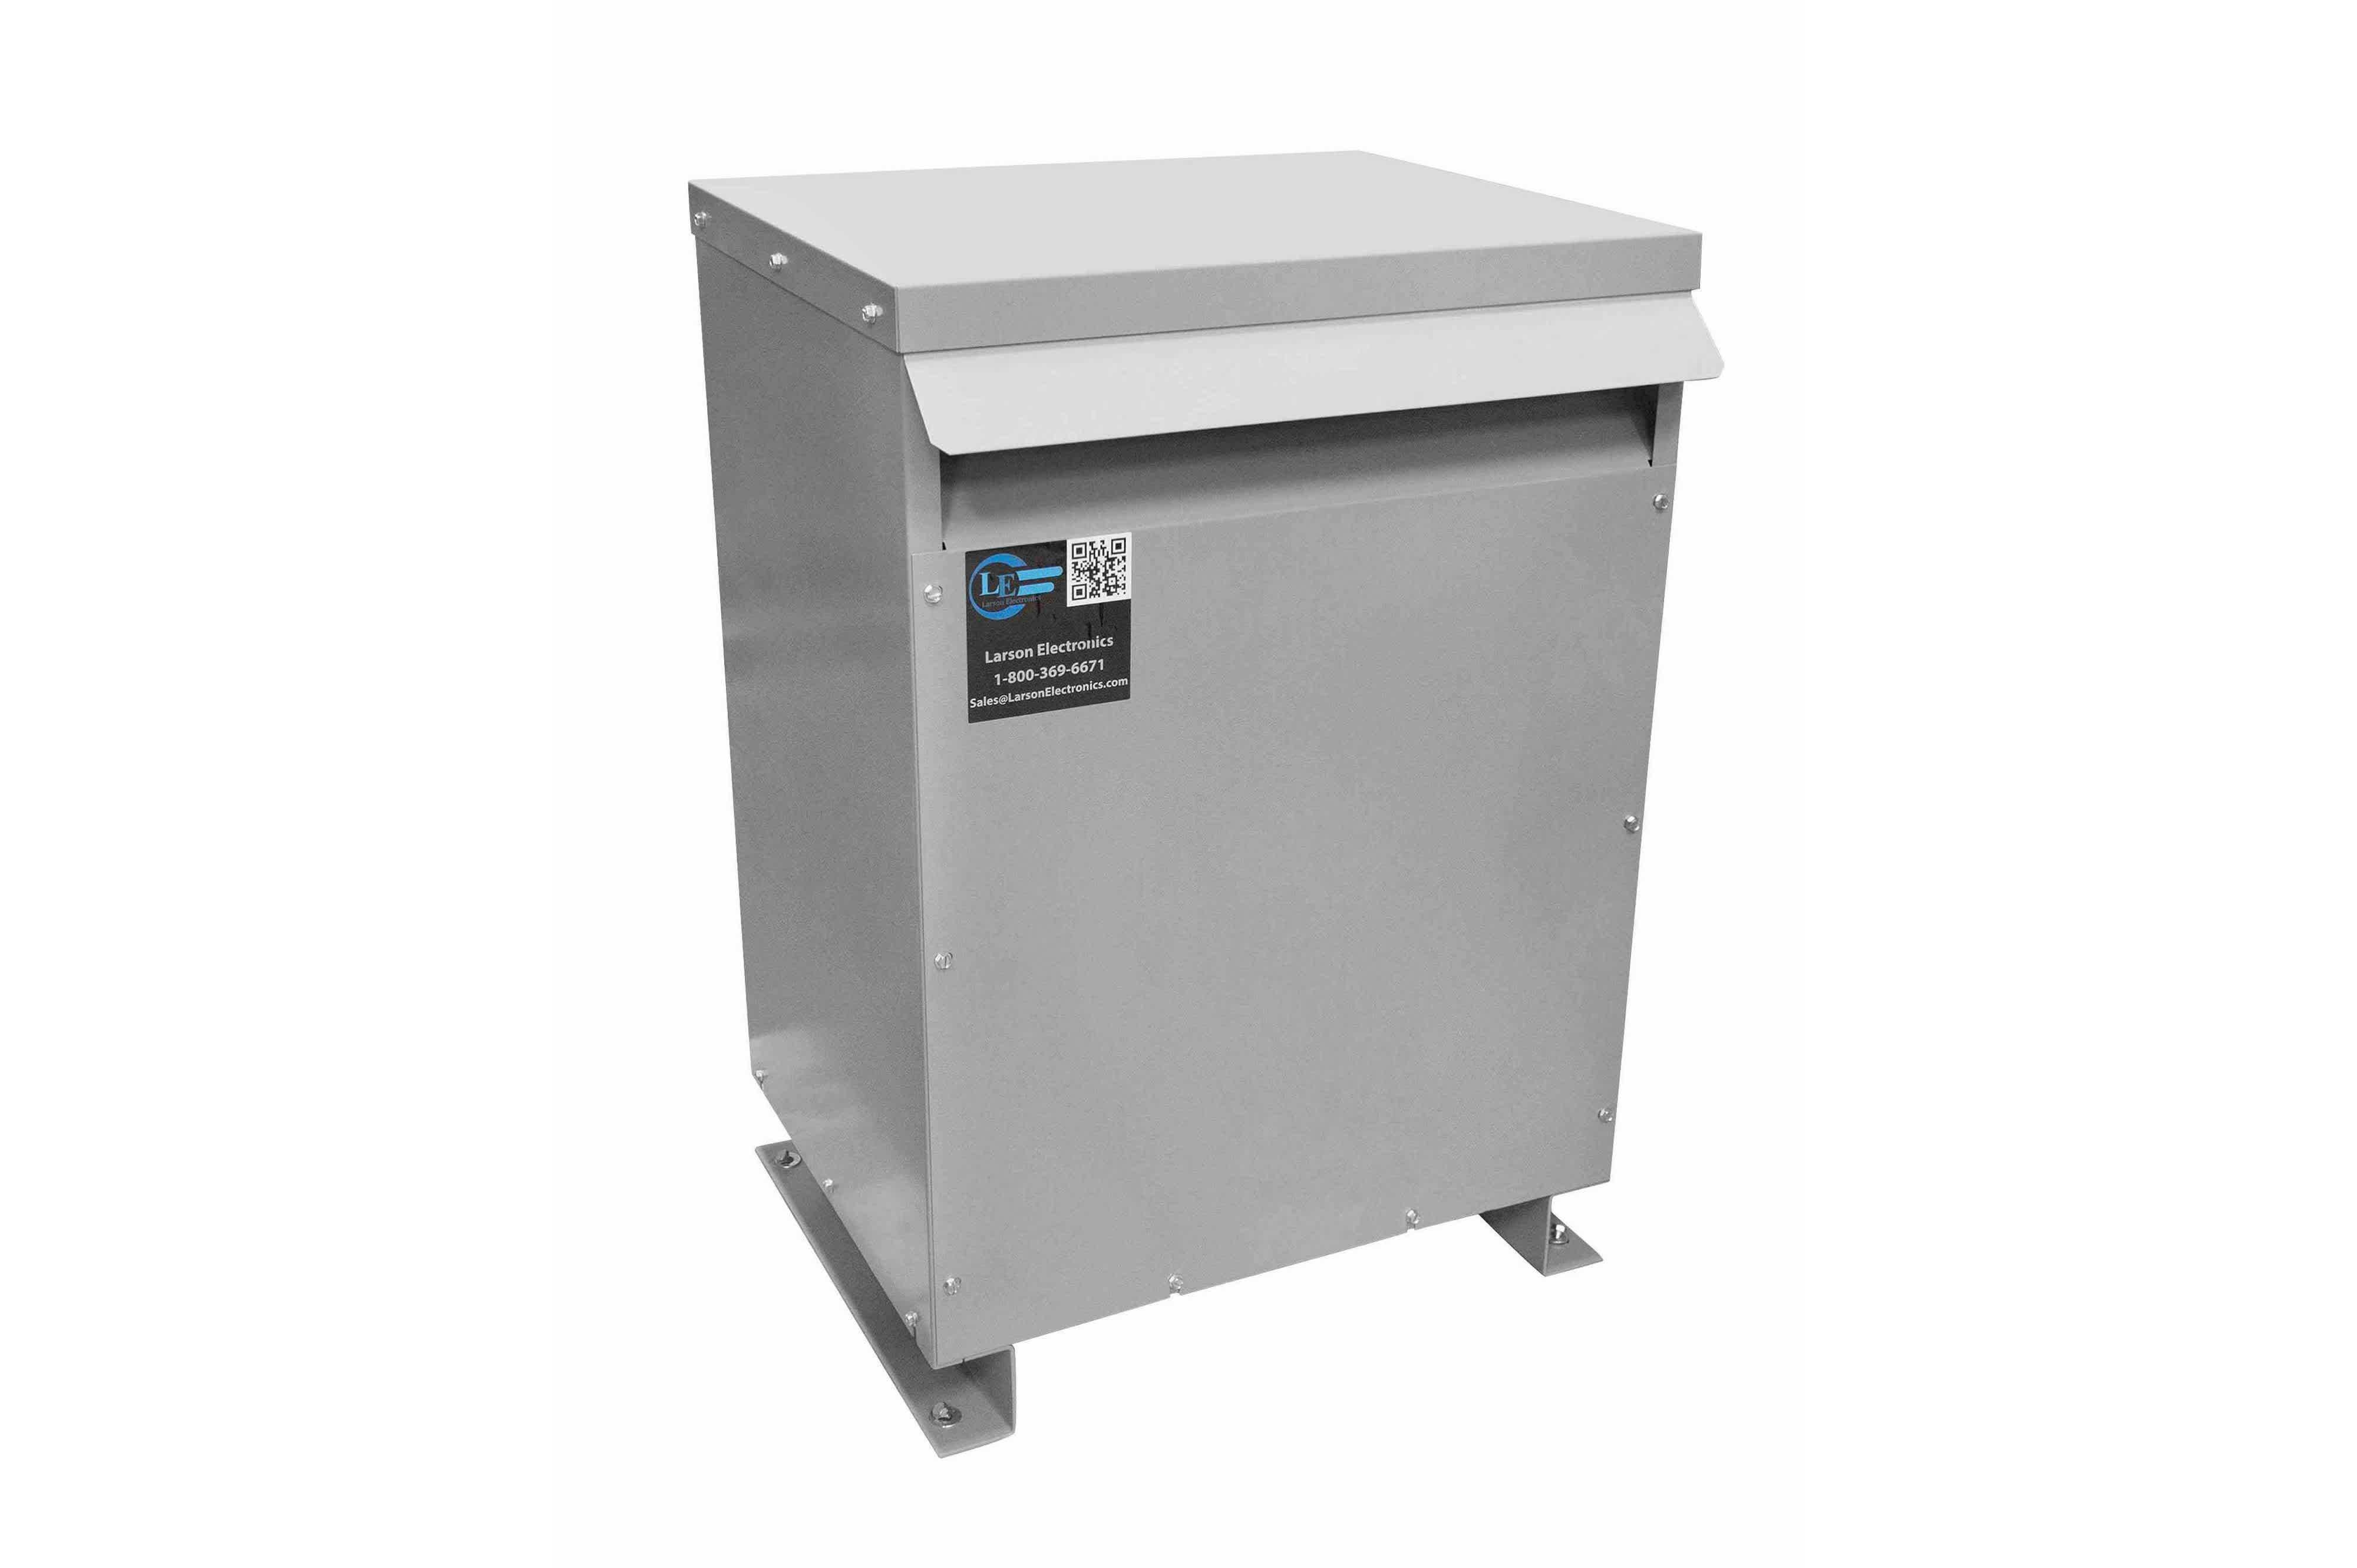 600 kVA 3PH Isolation Transformer, 400V Wye Primary, 480Y/277 Wye-N Secondary, N3R, Ventilated, 60 Hz